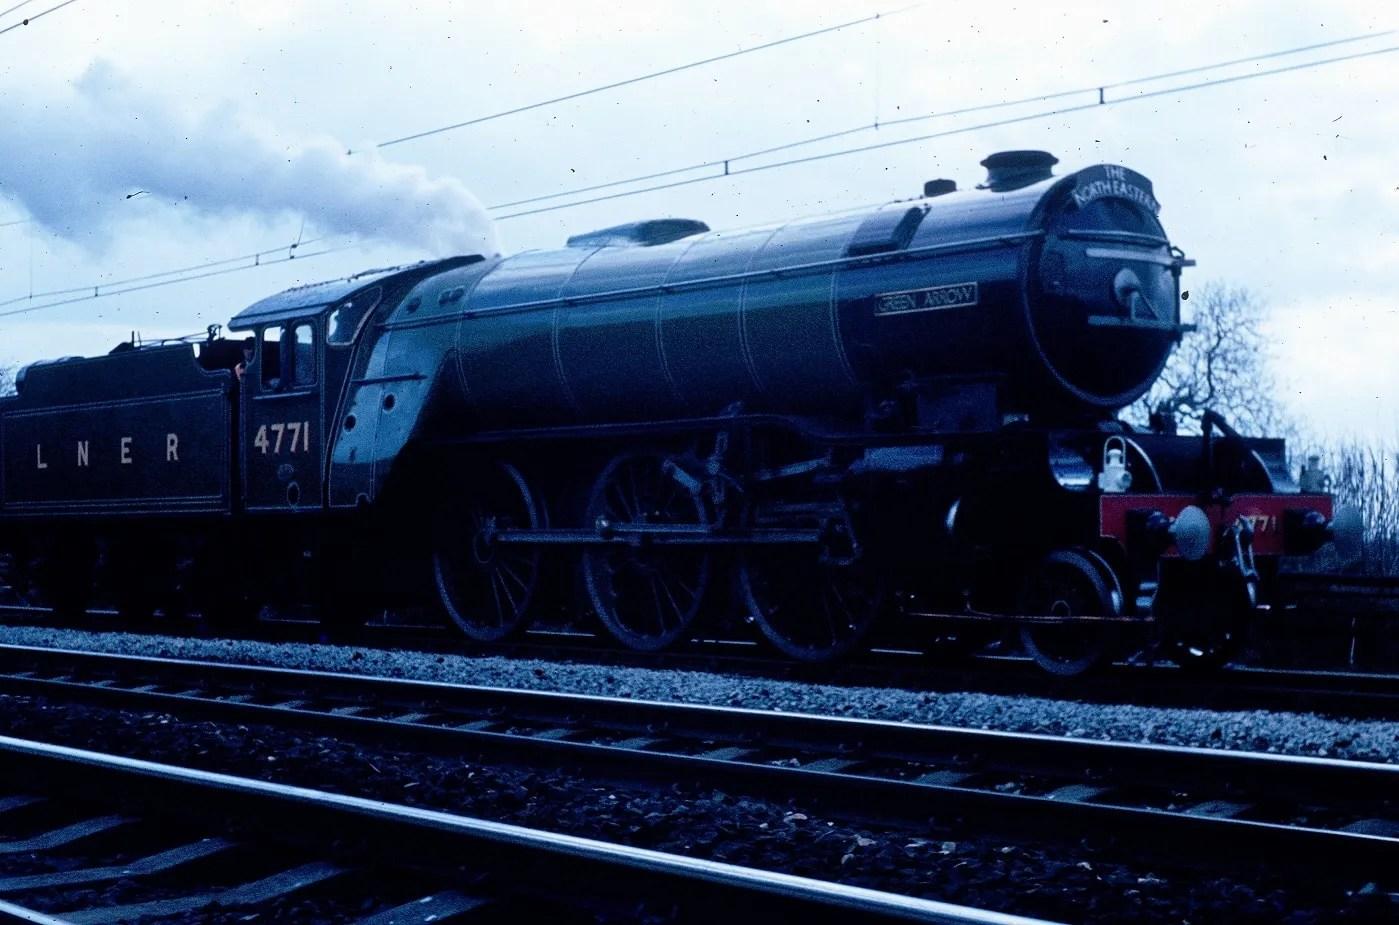 Green Arrow 4771 V2 locomotive